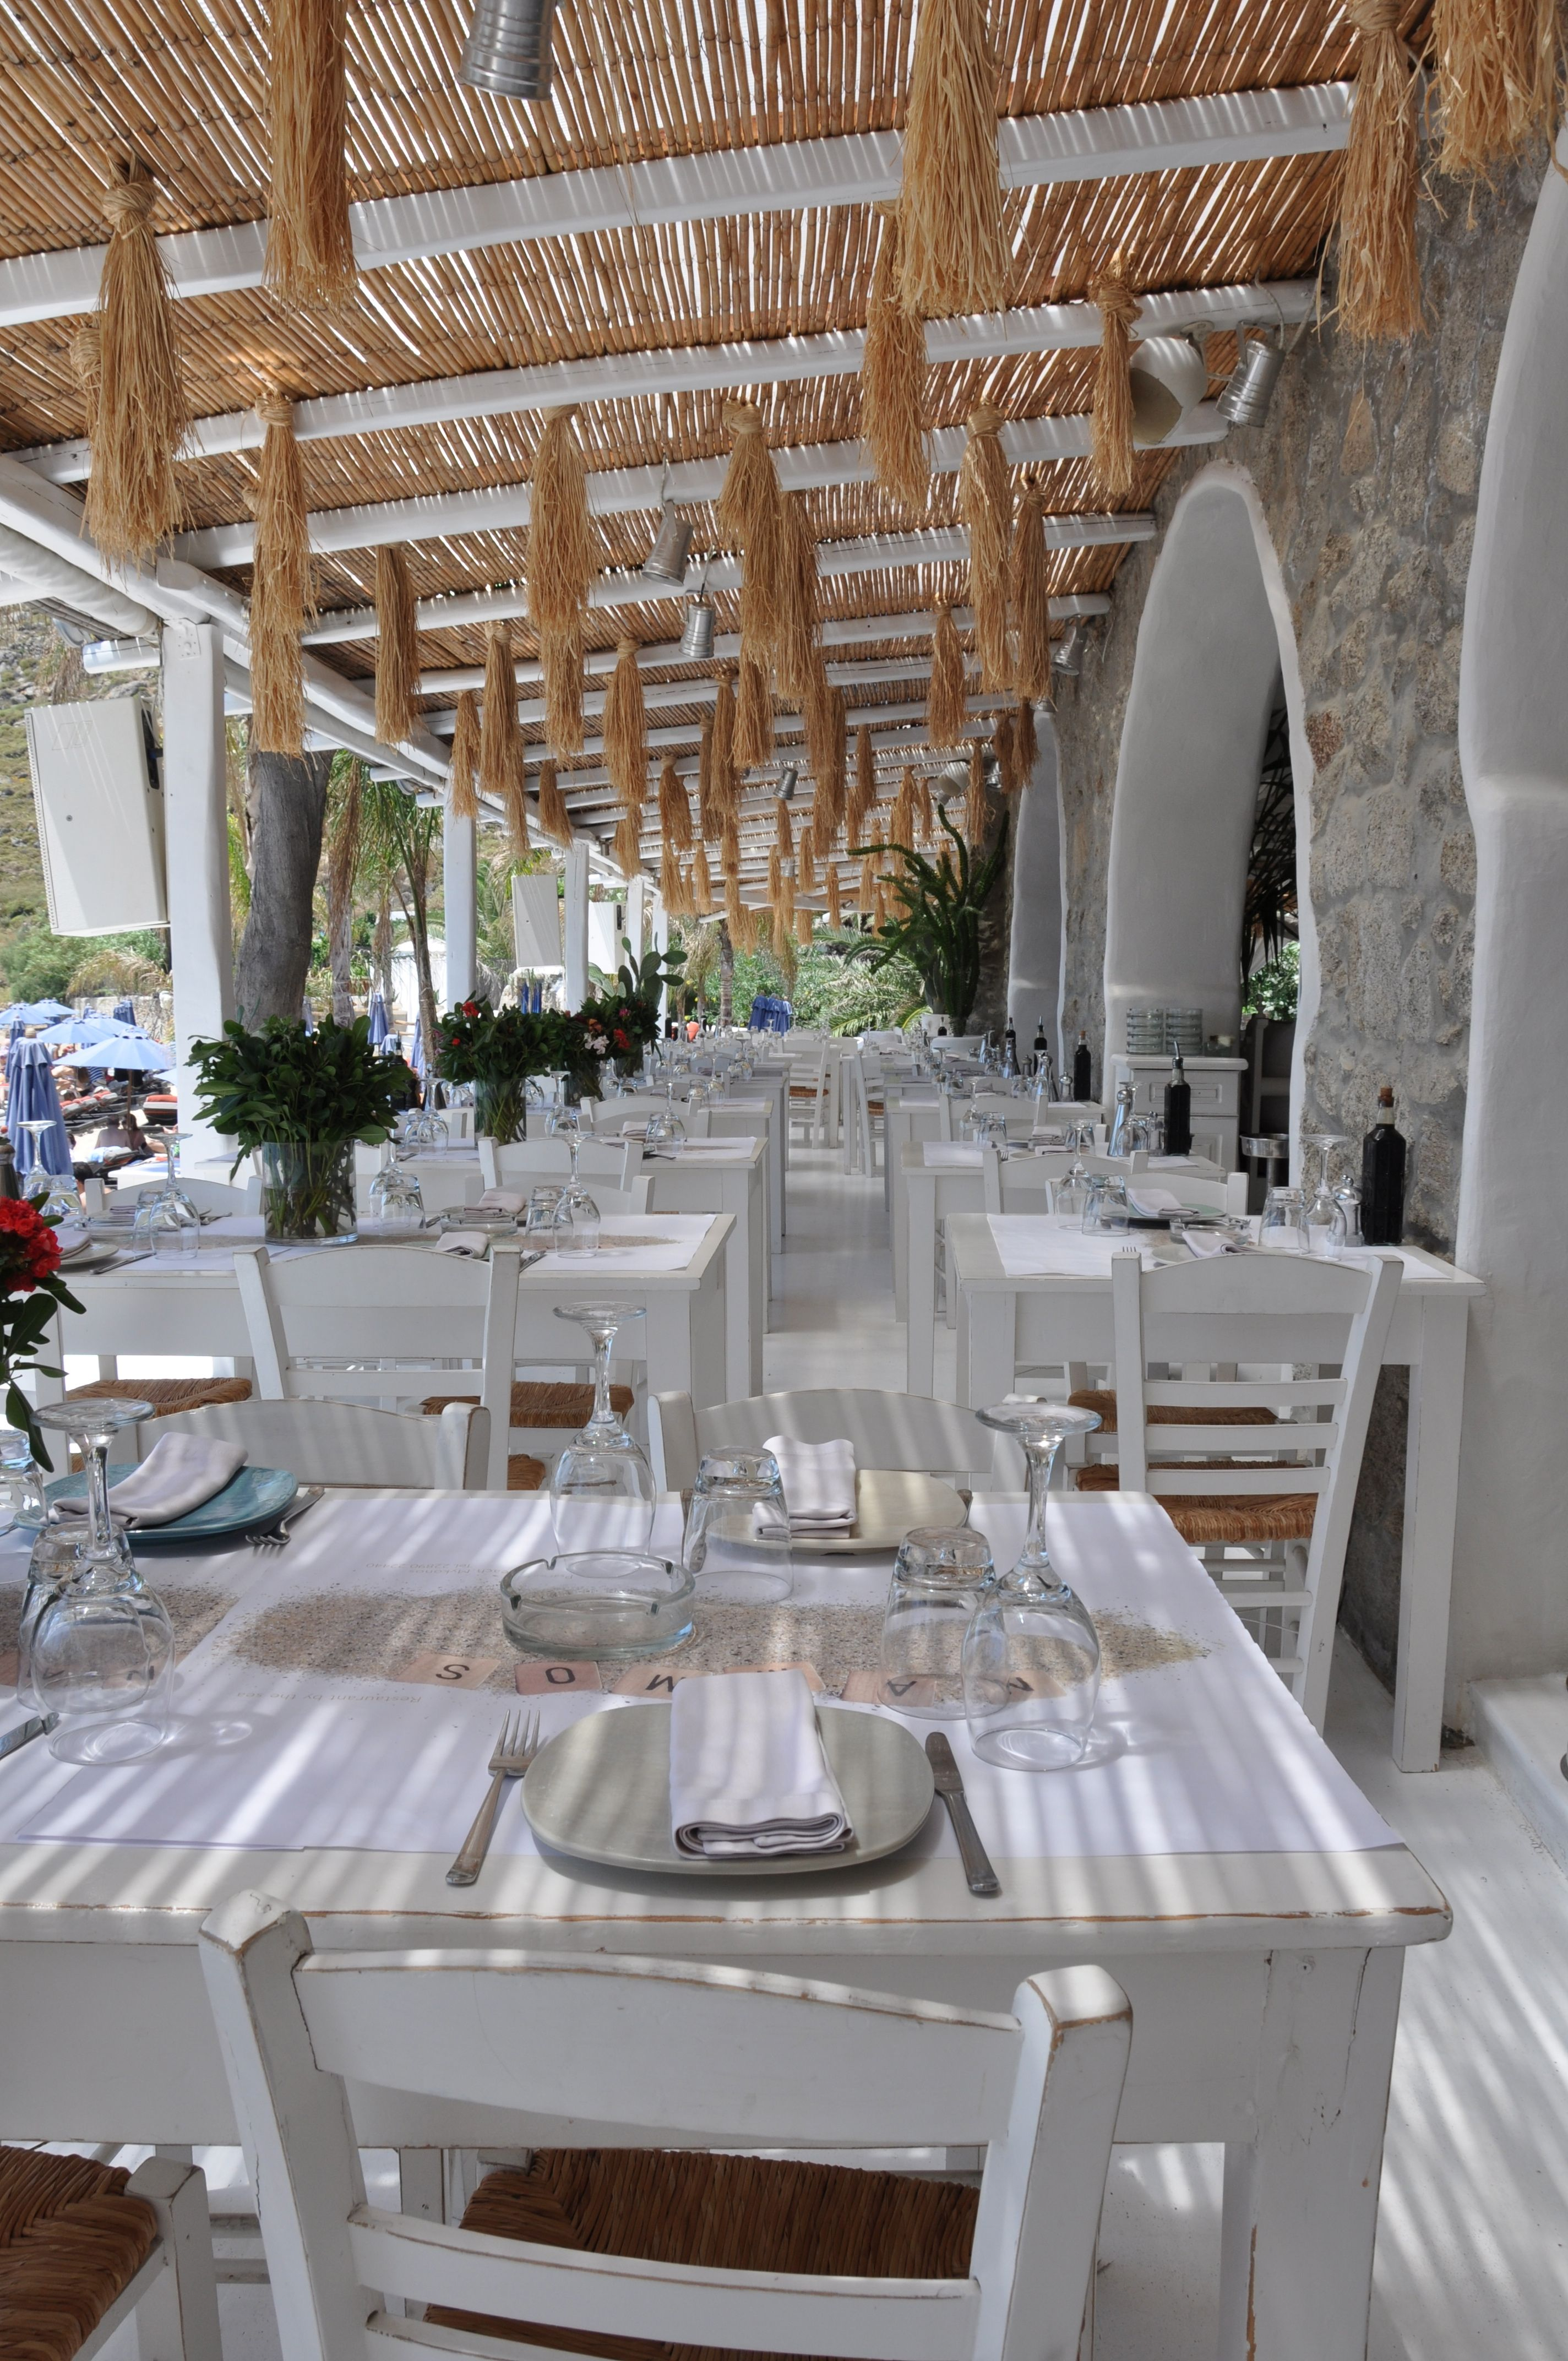 nammos beach restaurant the best mykonos | feldmann`s tips